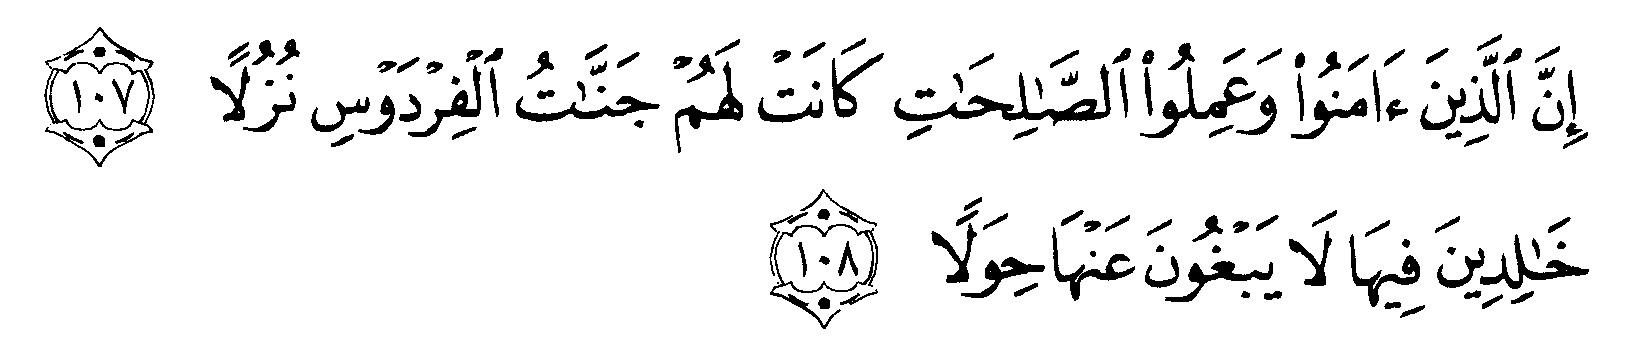 Tafsir Ibnu Katsir Surah Al Kahfi Ayat 107 108 Alquranmulia